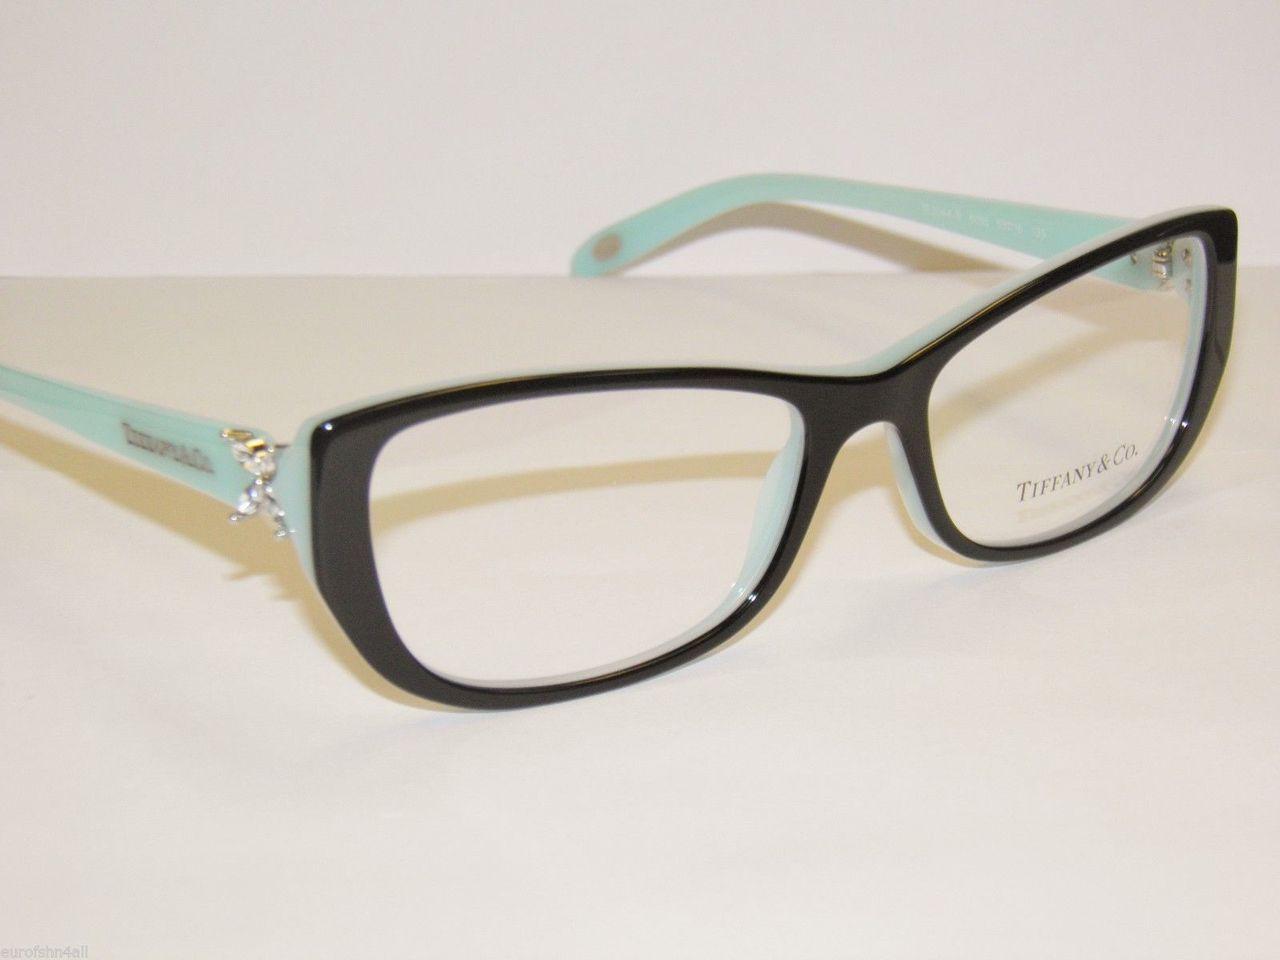 e0c1b4fb2fc5 TIFFANY TF 2044B Eyeglasses 8055 Blk Blue 53-16-135 - Elite Eyewear ...